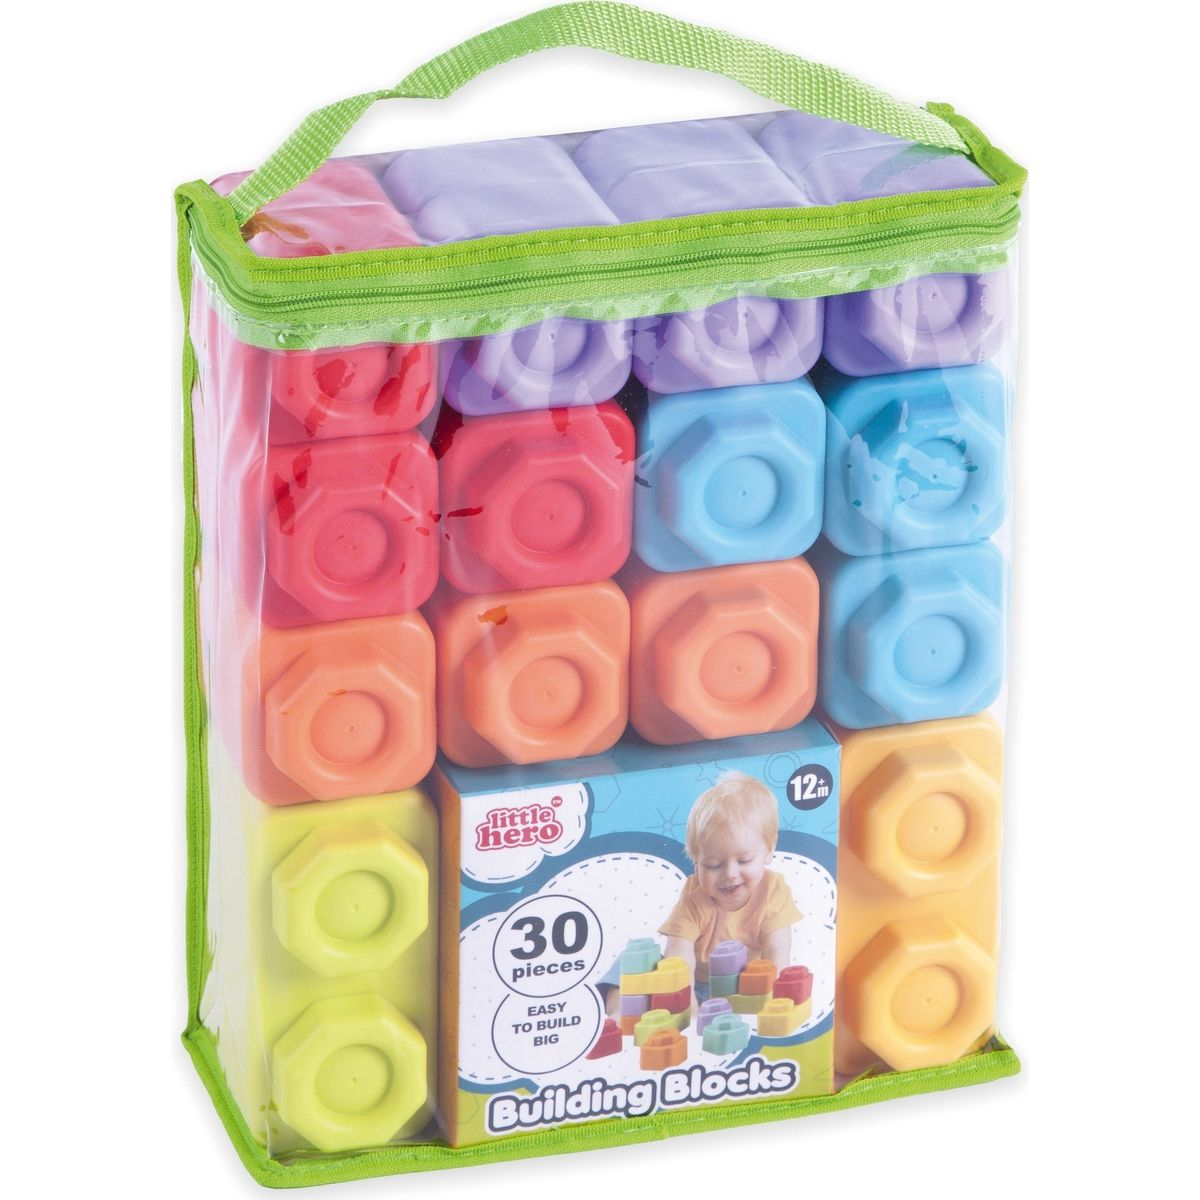 Kostky měkké gumové 30ks